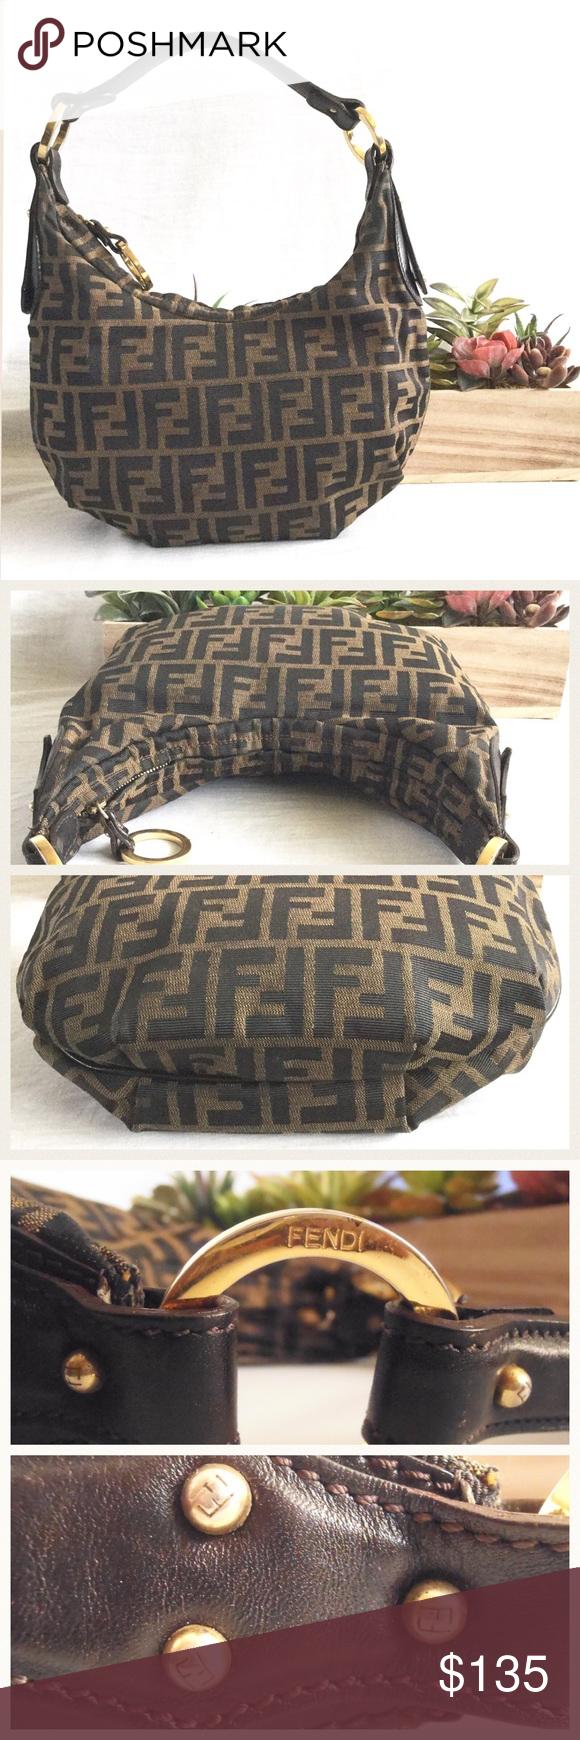 404c4f2898a Vintage Fendi Zucca Hobo Bag Authentic vintage Fendi hobo. Measures about  11